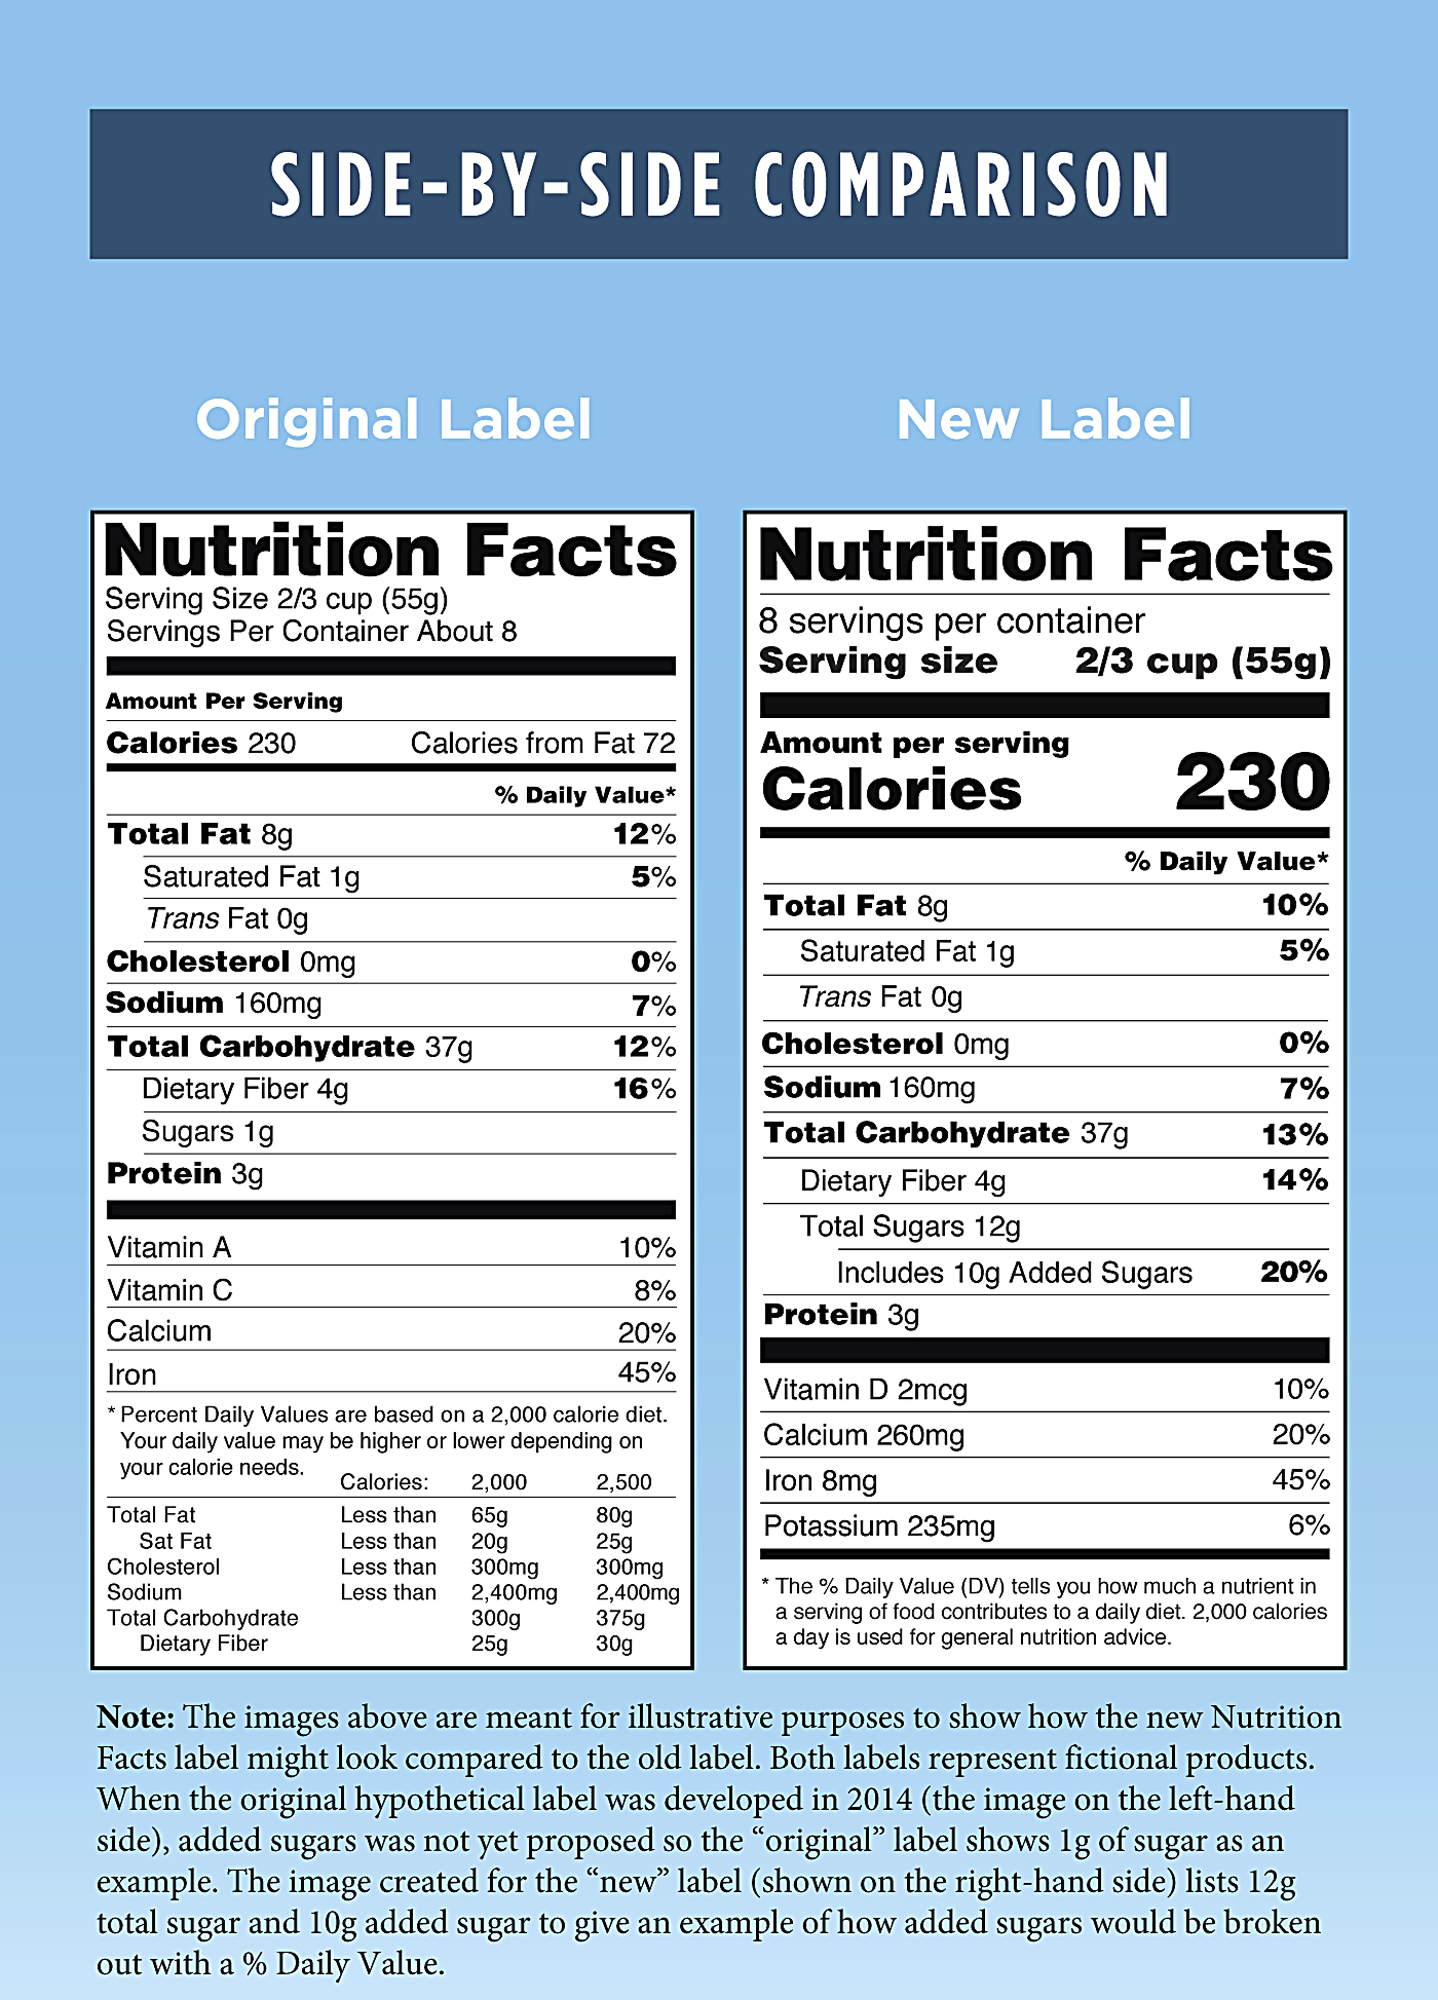 Fda Delays Revamped Nutrition Facts Panel